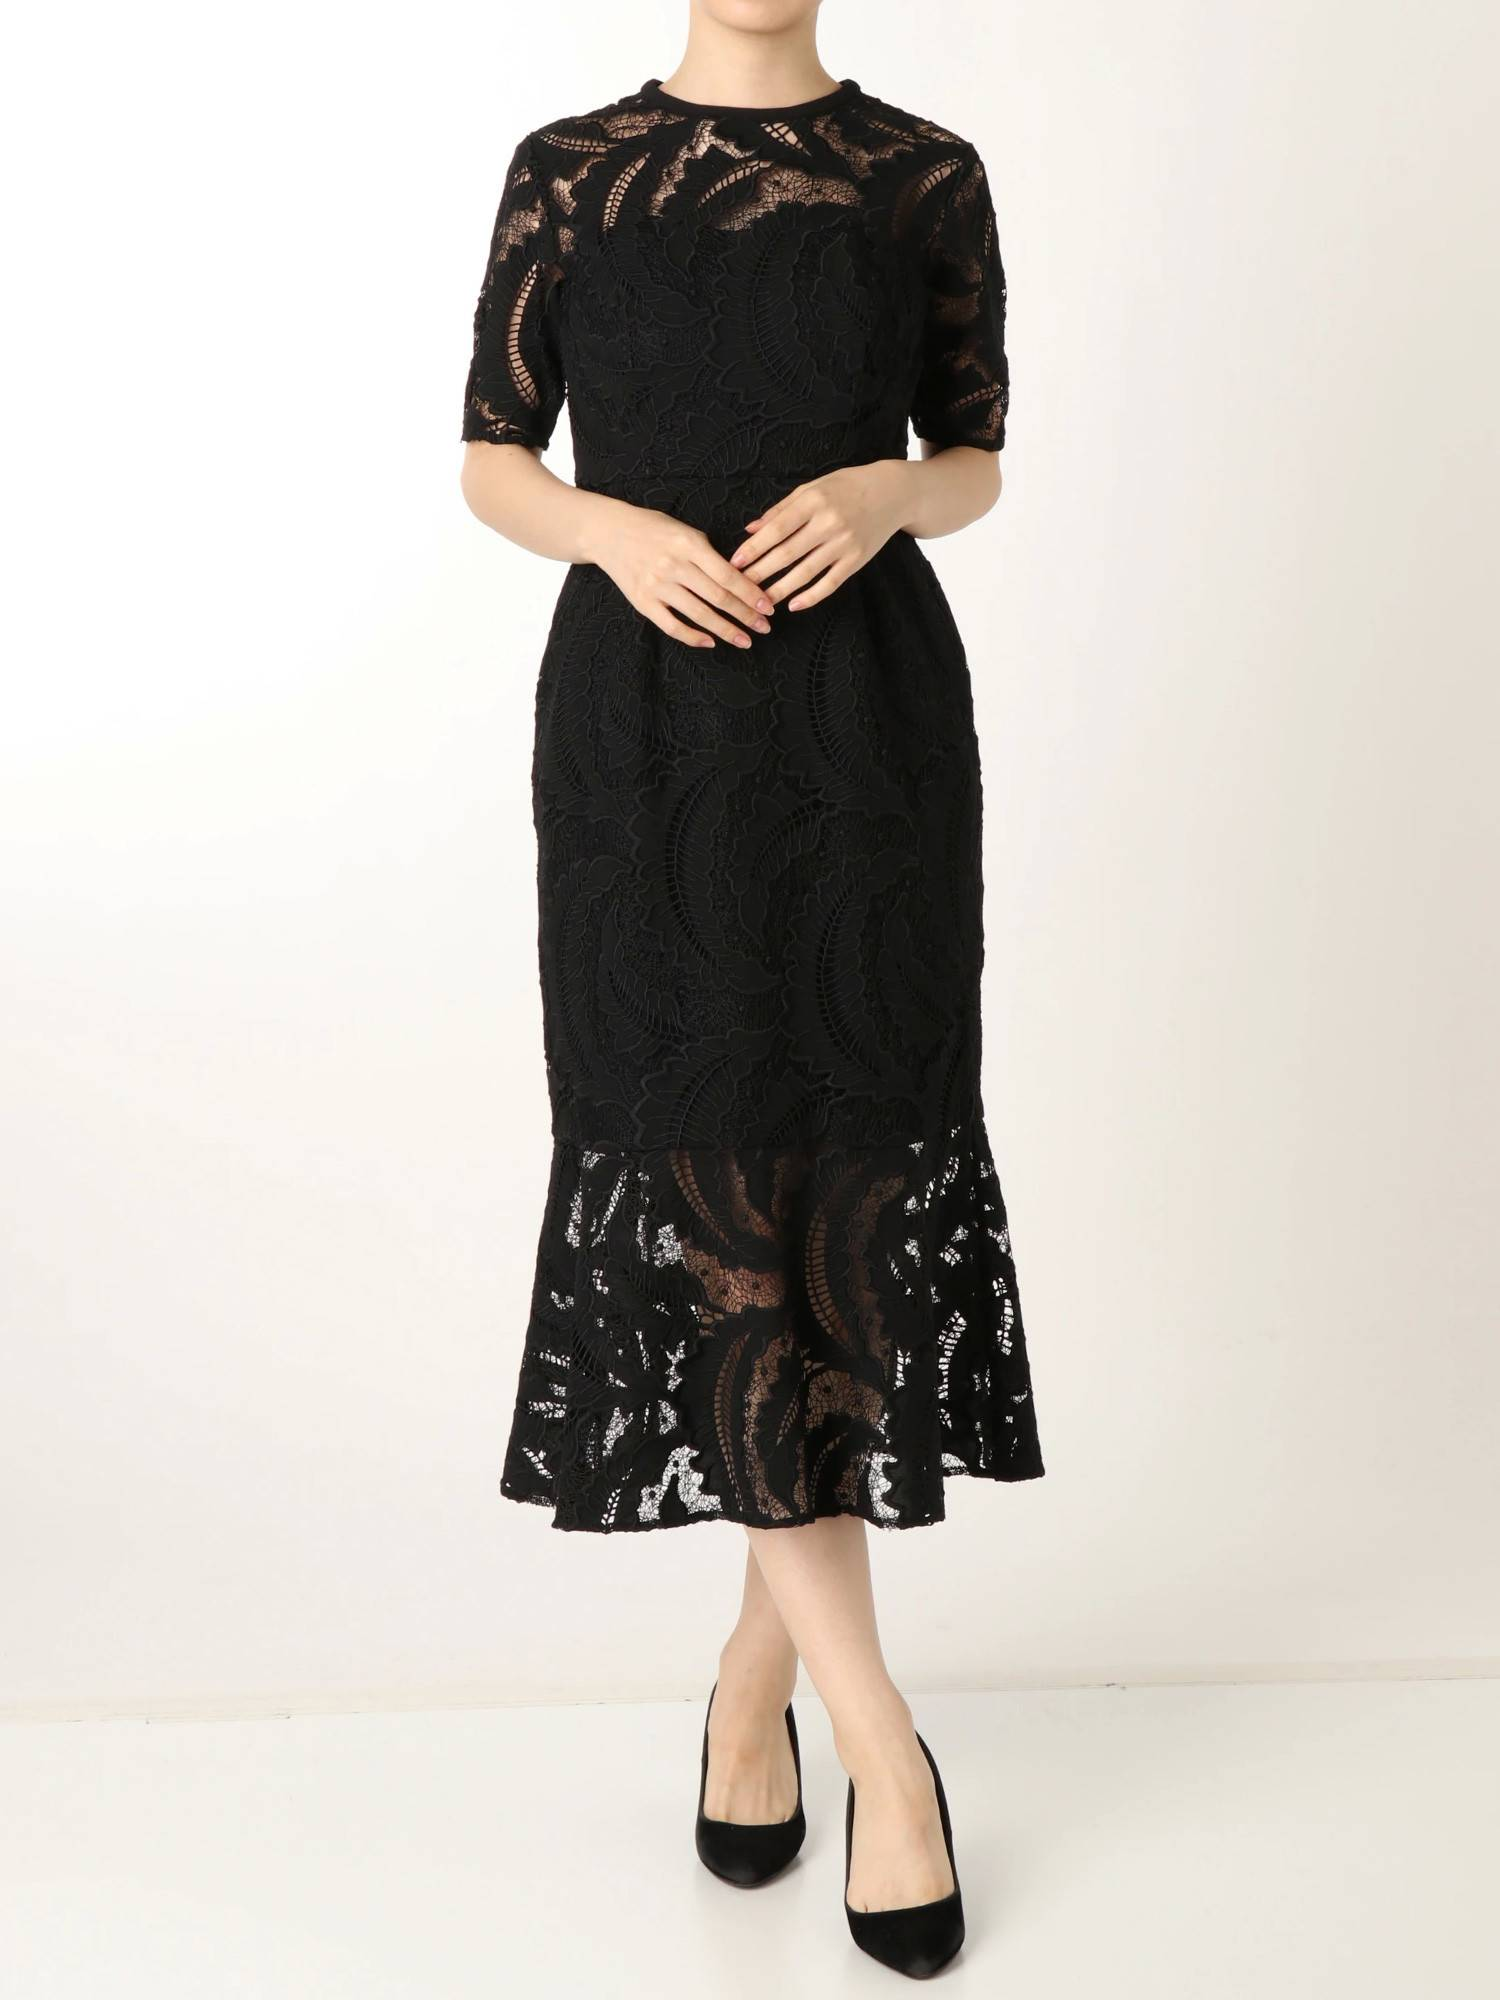 LADY叶刺绣蕾丝连衣裙